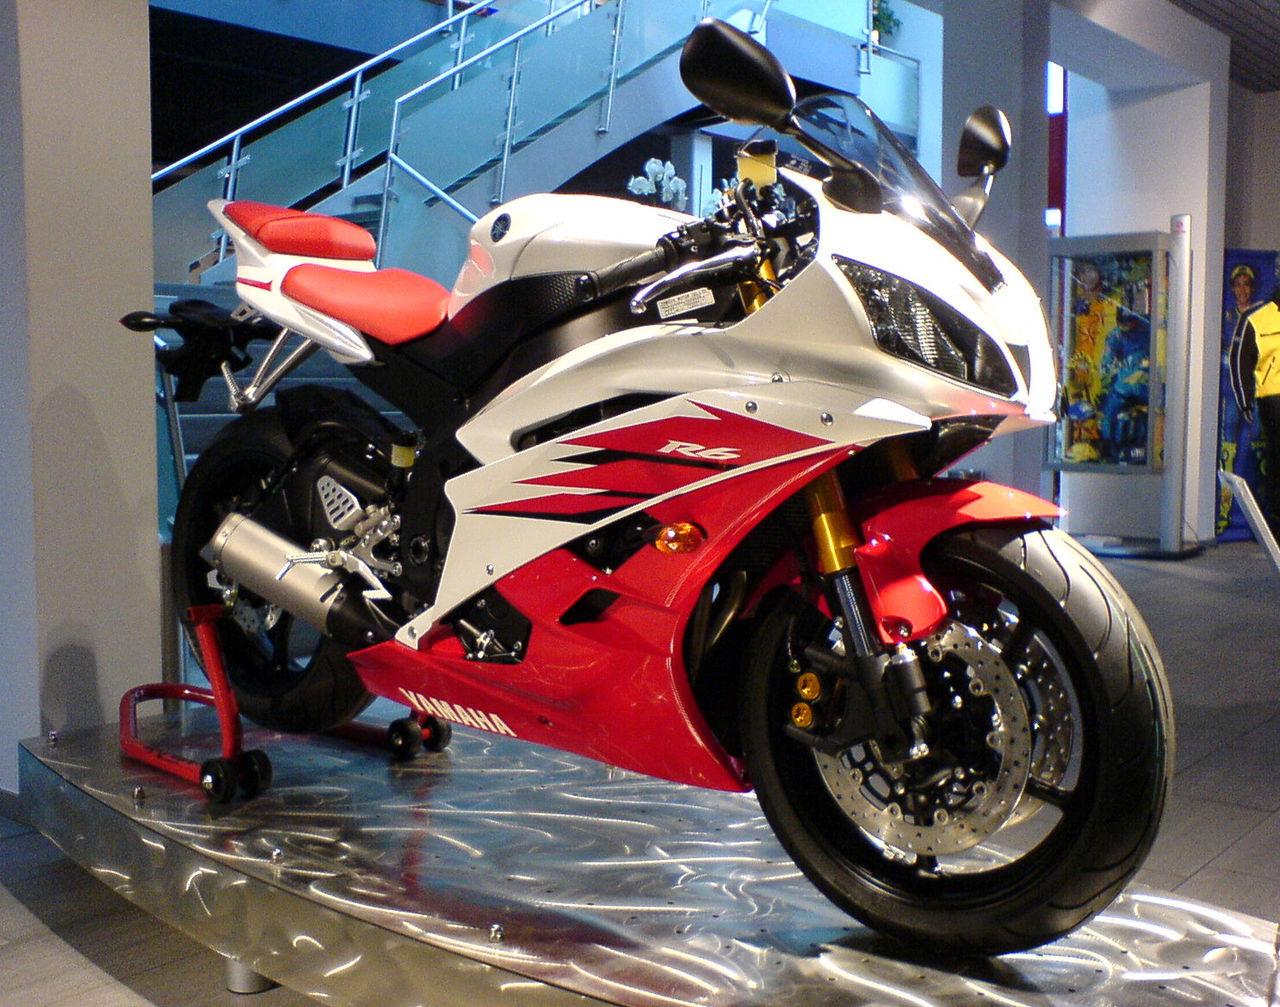 File:Yamaha YZF R6 2006 red.jpg - Wikimedia Commons